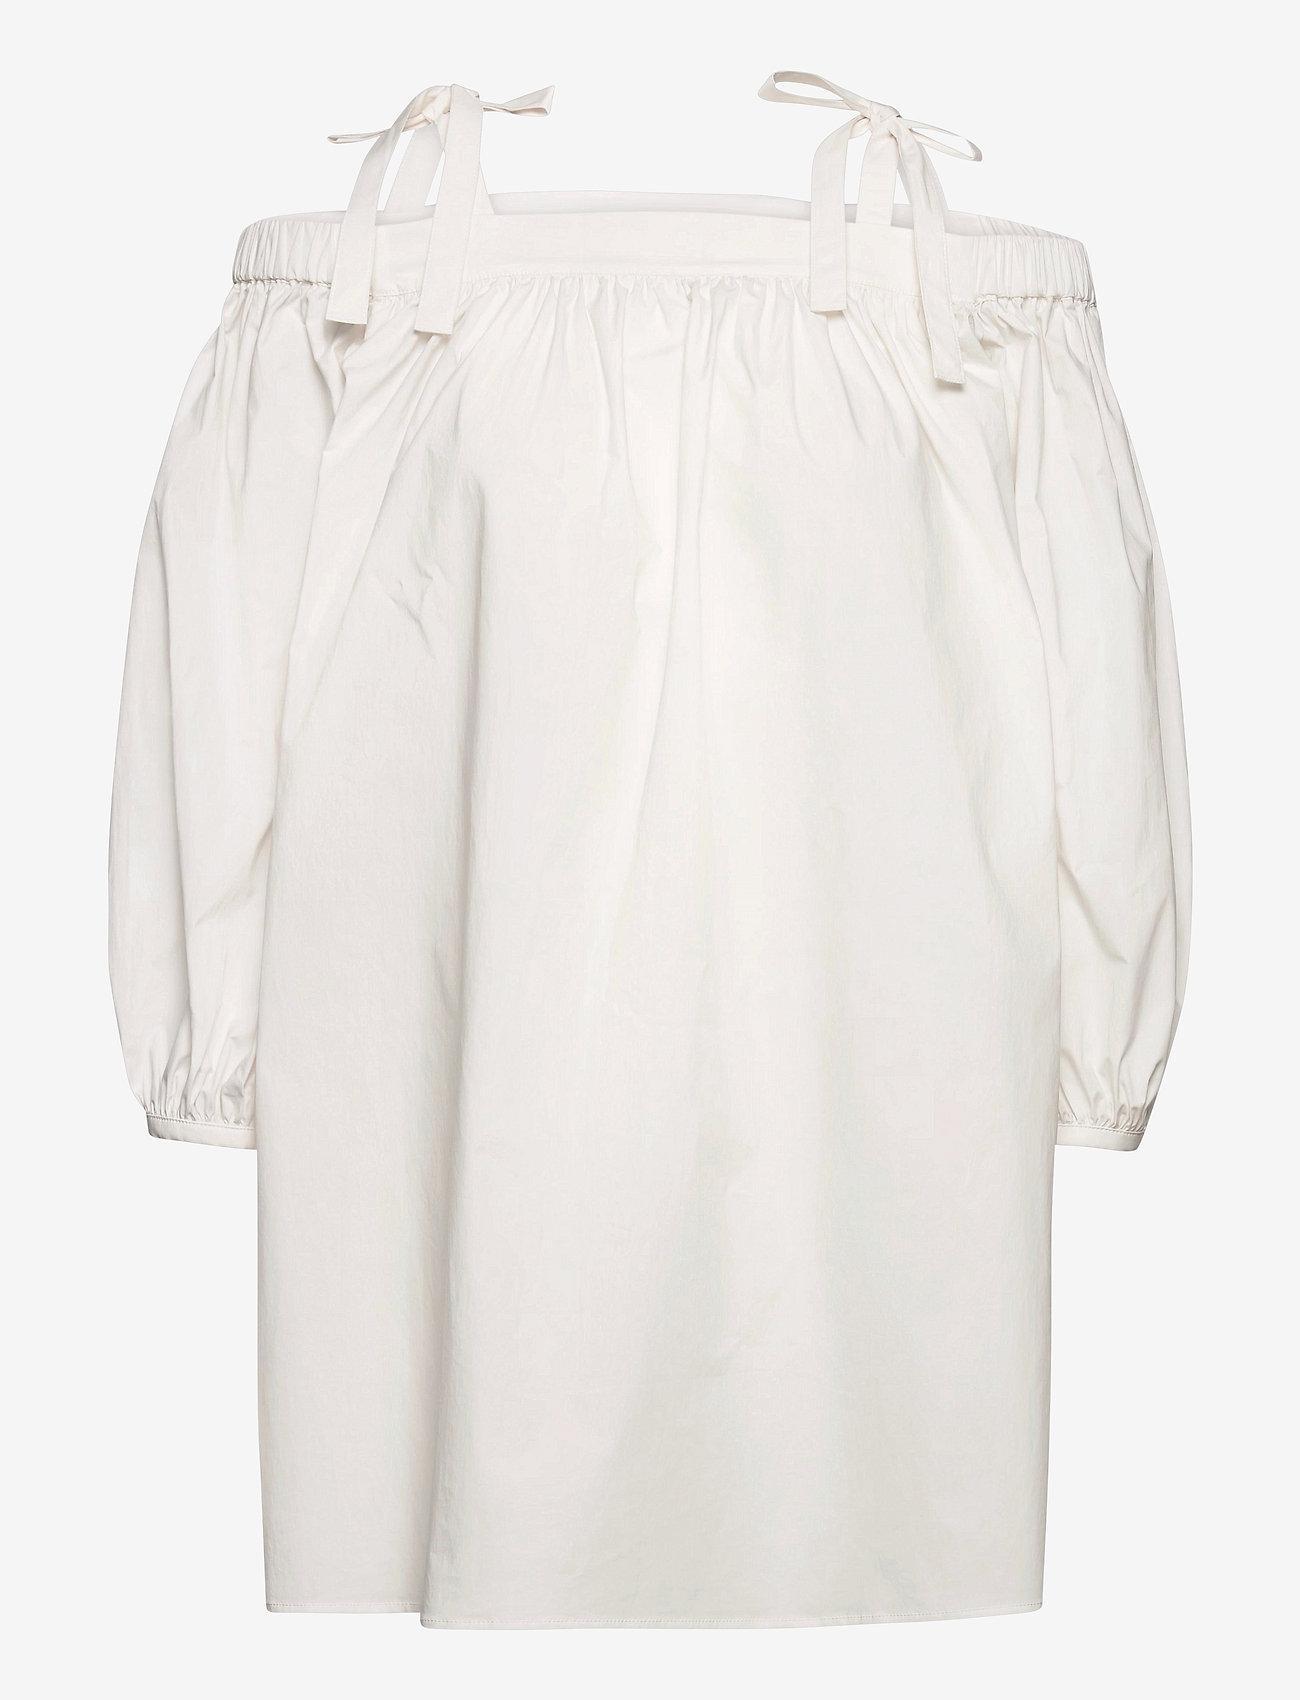 Boutique Moschino - Boutique Moschino DRESS - sommerkjoler - white - 0